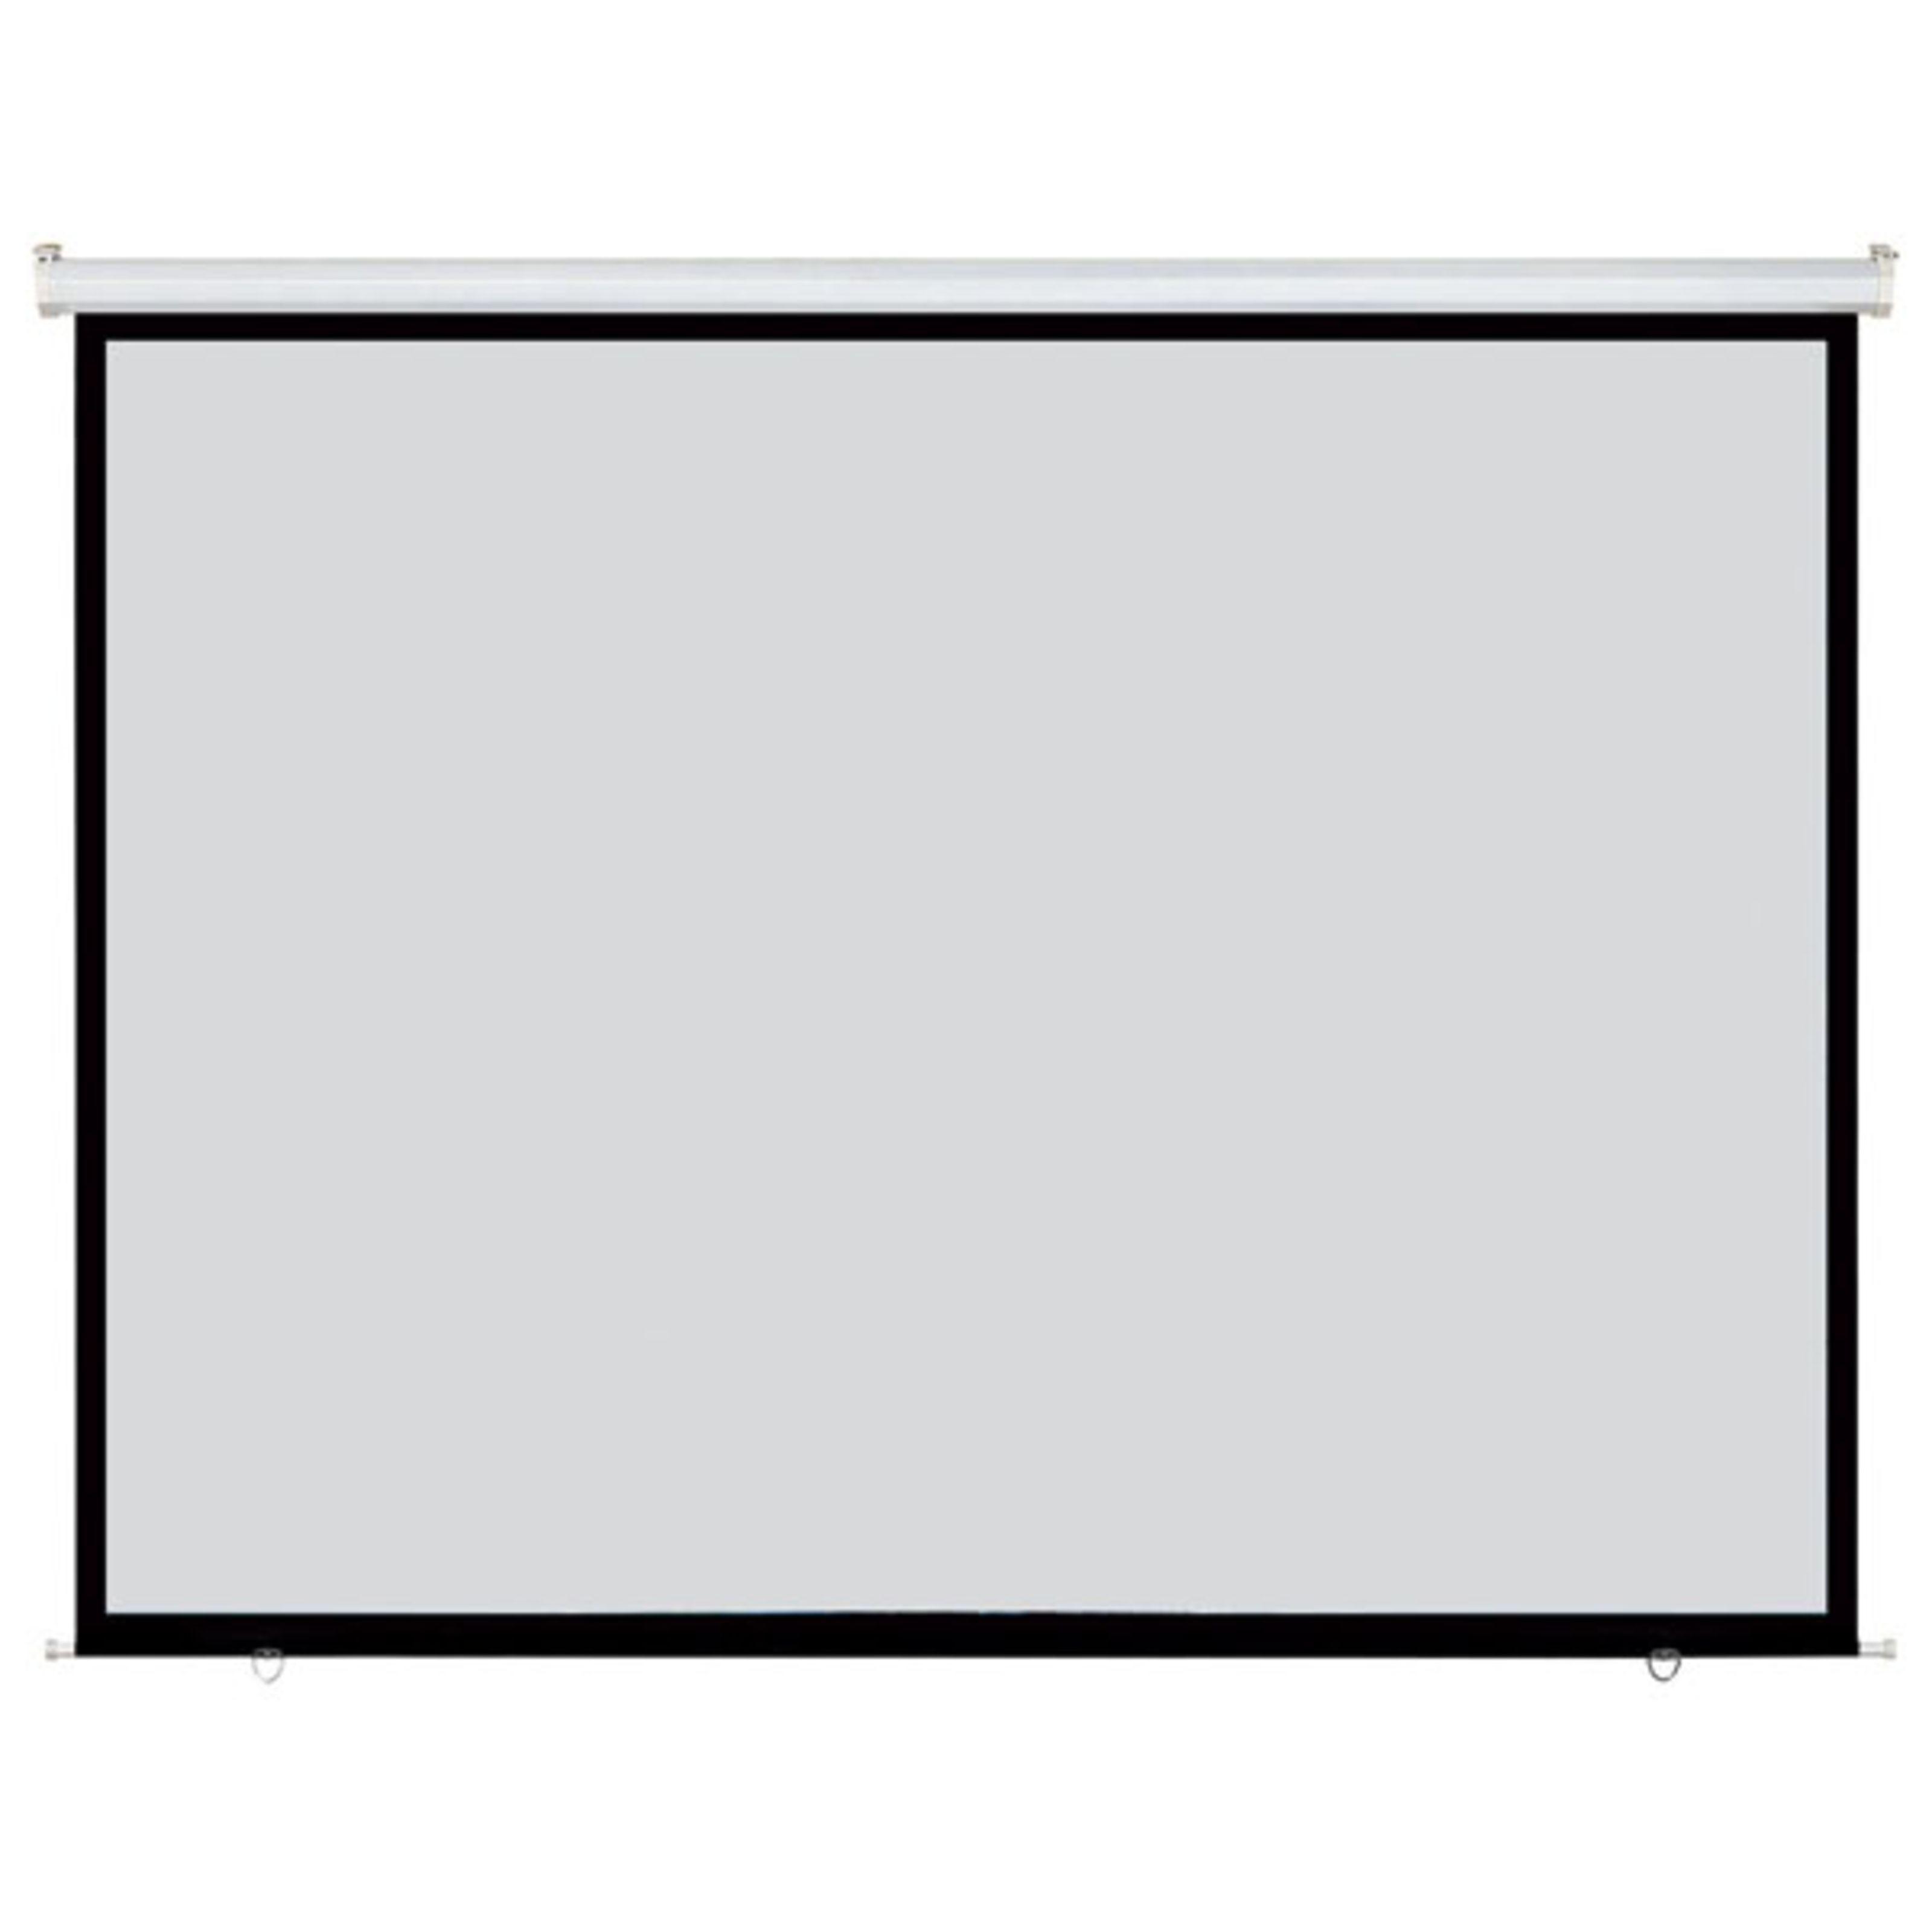 dmt proscreen manual projector screen 72